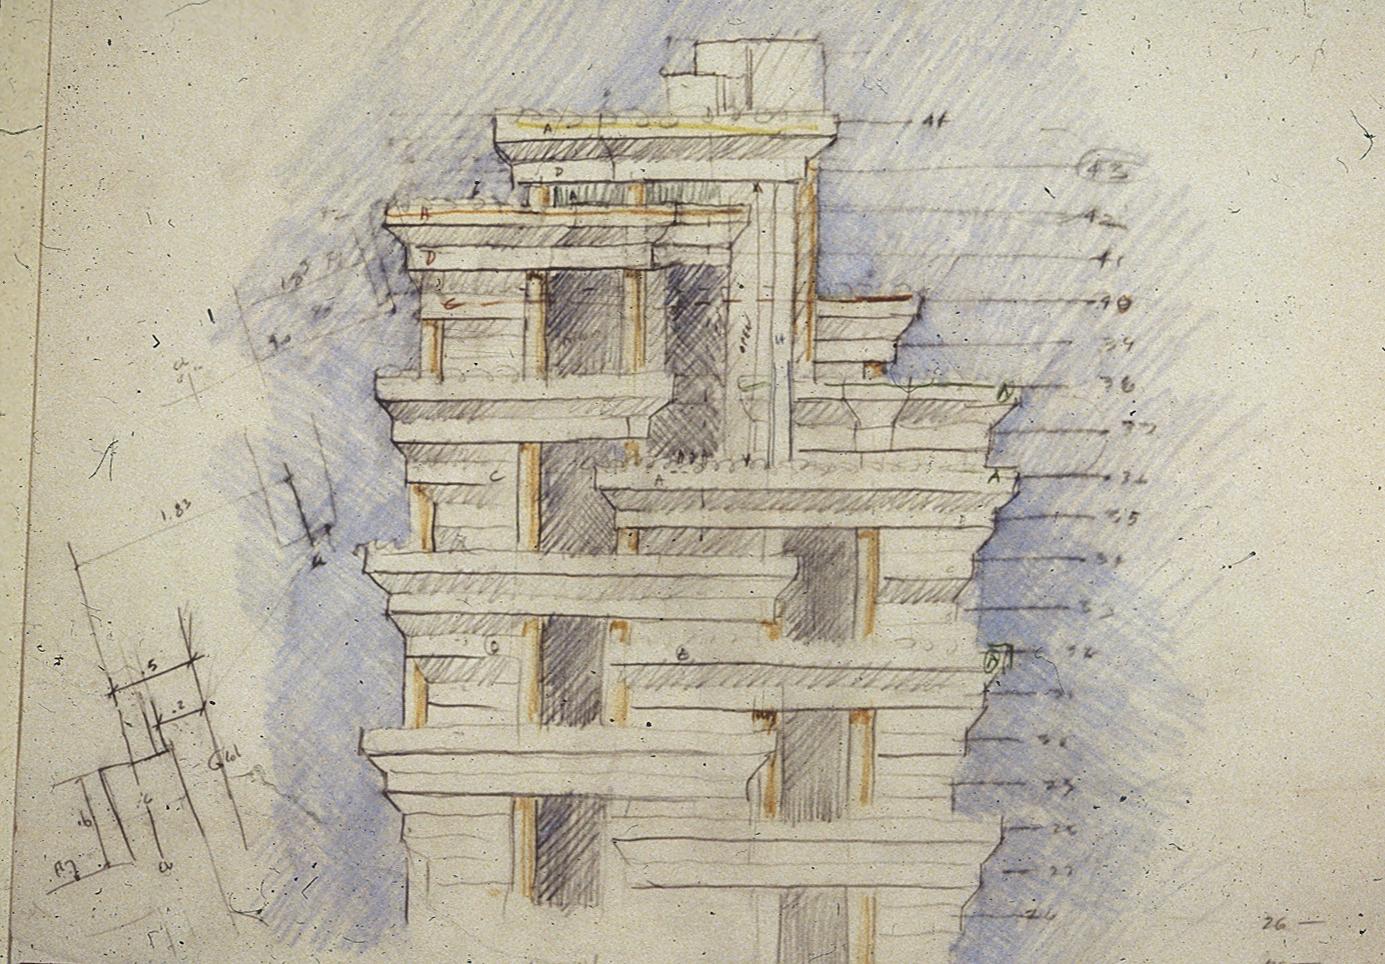 The Concourse, Beach Road, Singapore. Final Scheme. Sketch of Tower Facade.